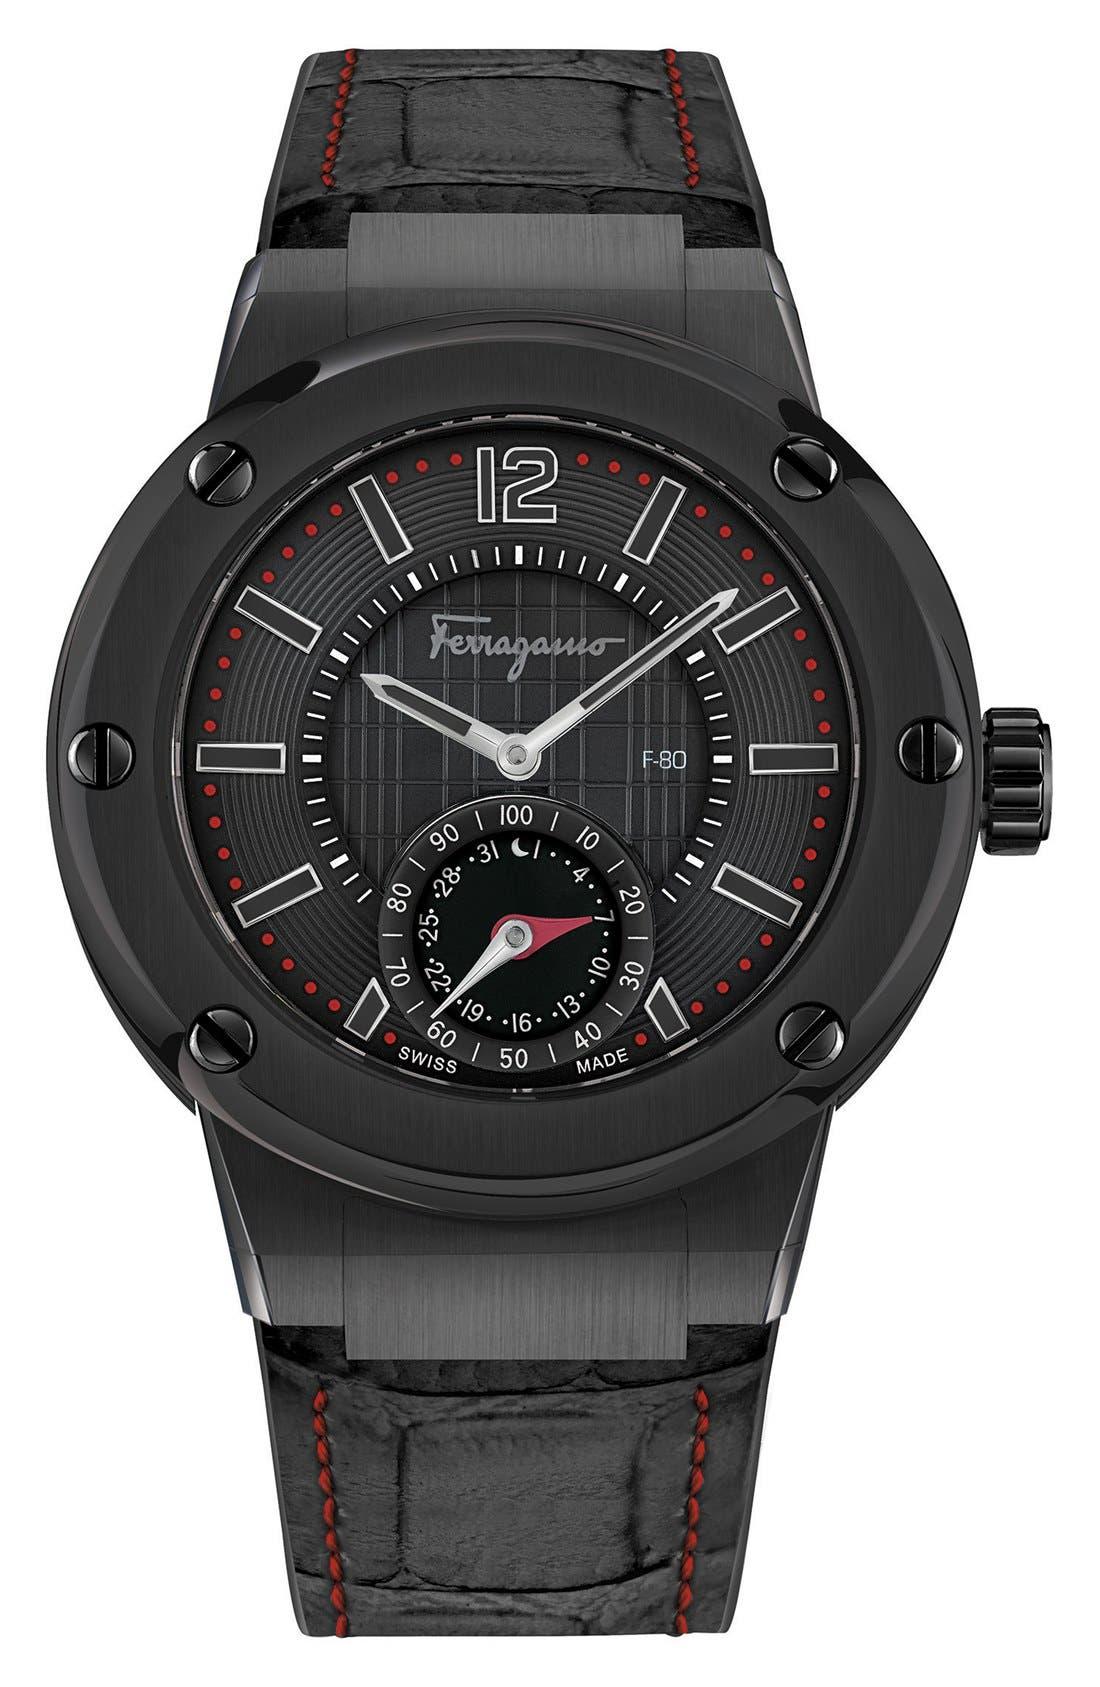 Main Image - Salvatore Ferragamo 'F-80 Motion' Leather Strap Smart Watch, 44mm